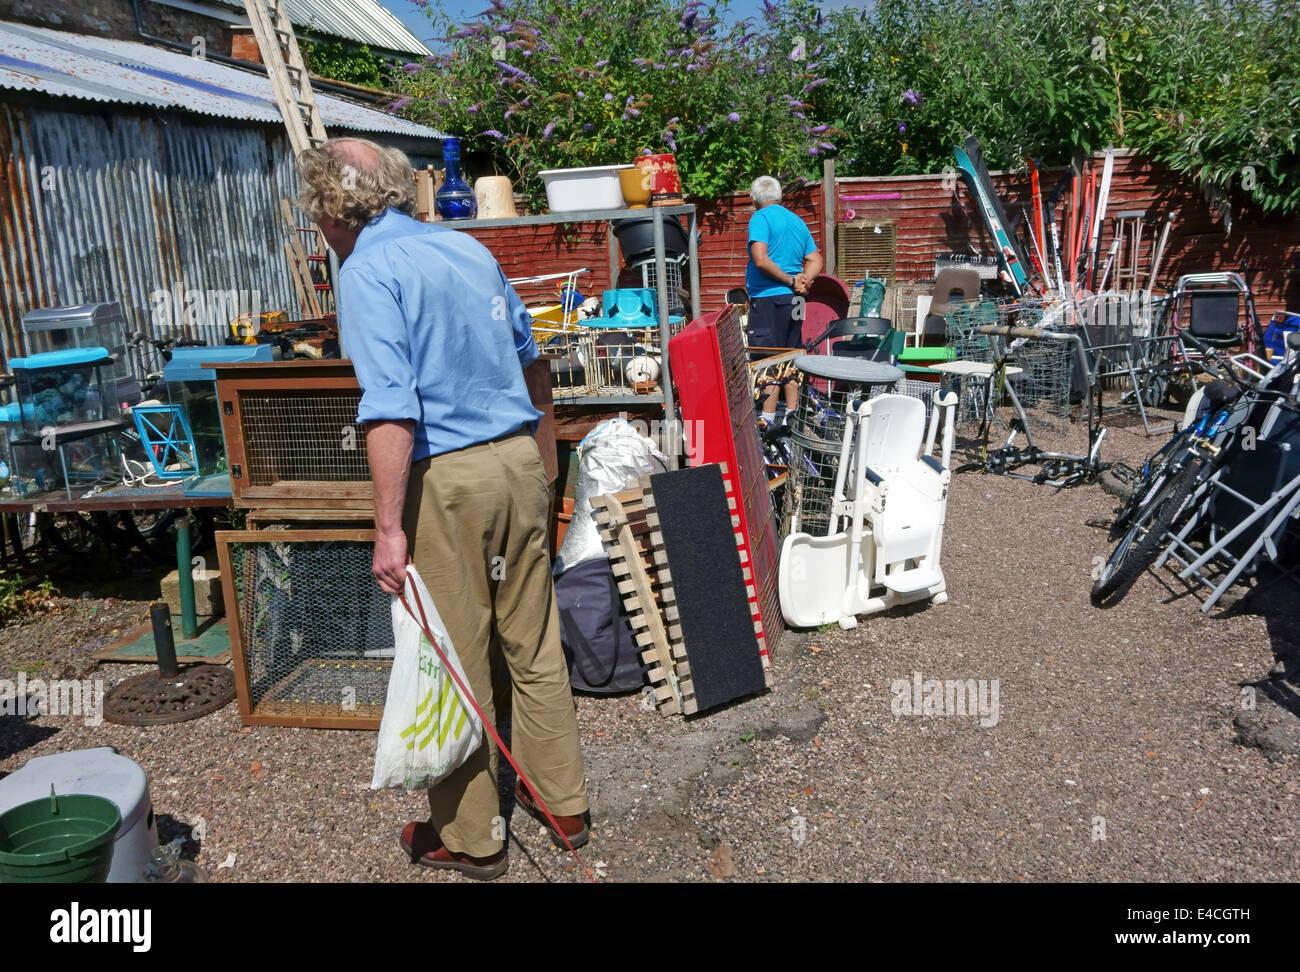 Customers browsing in junkyard in Wellington, Somerset - Stock Image